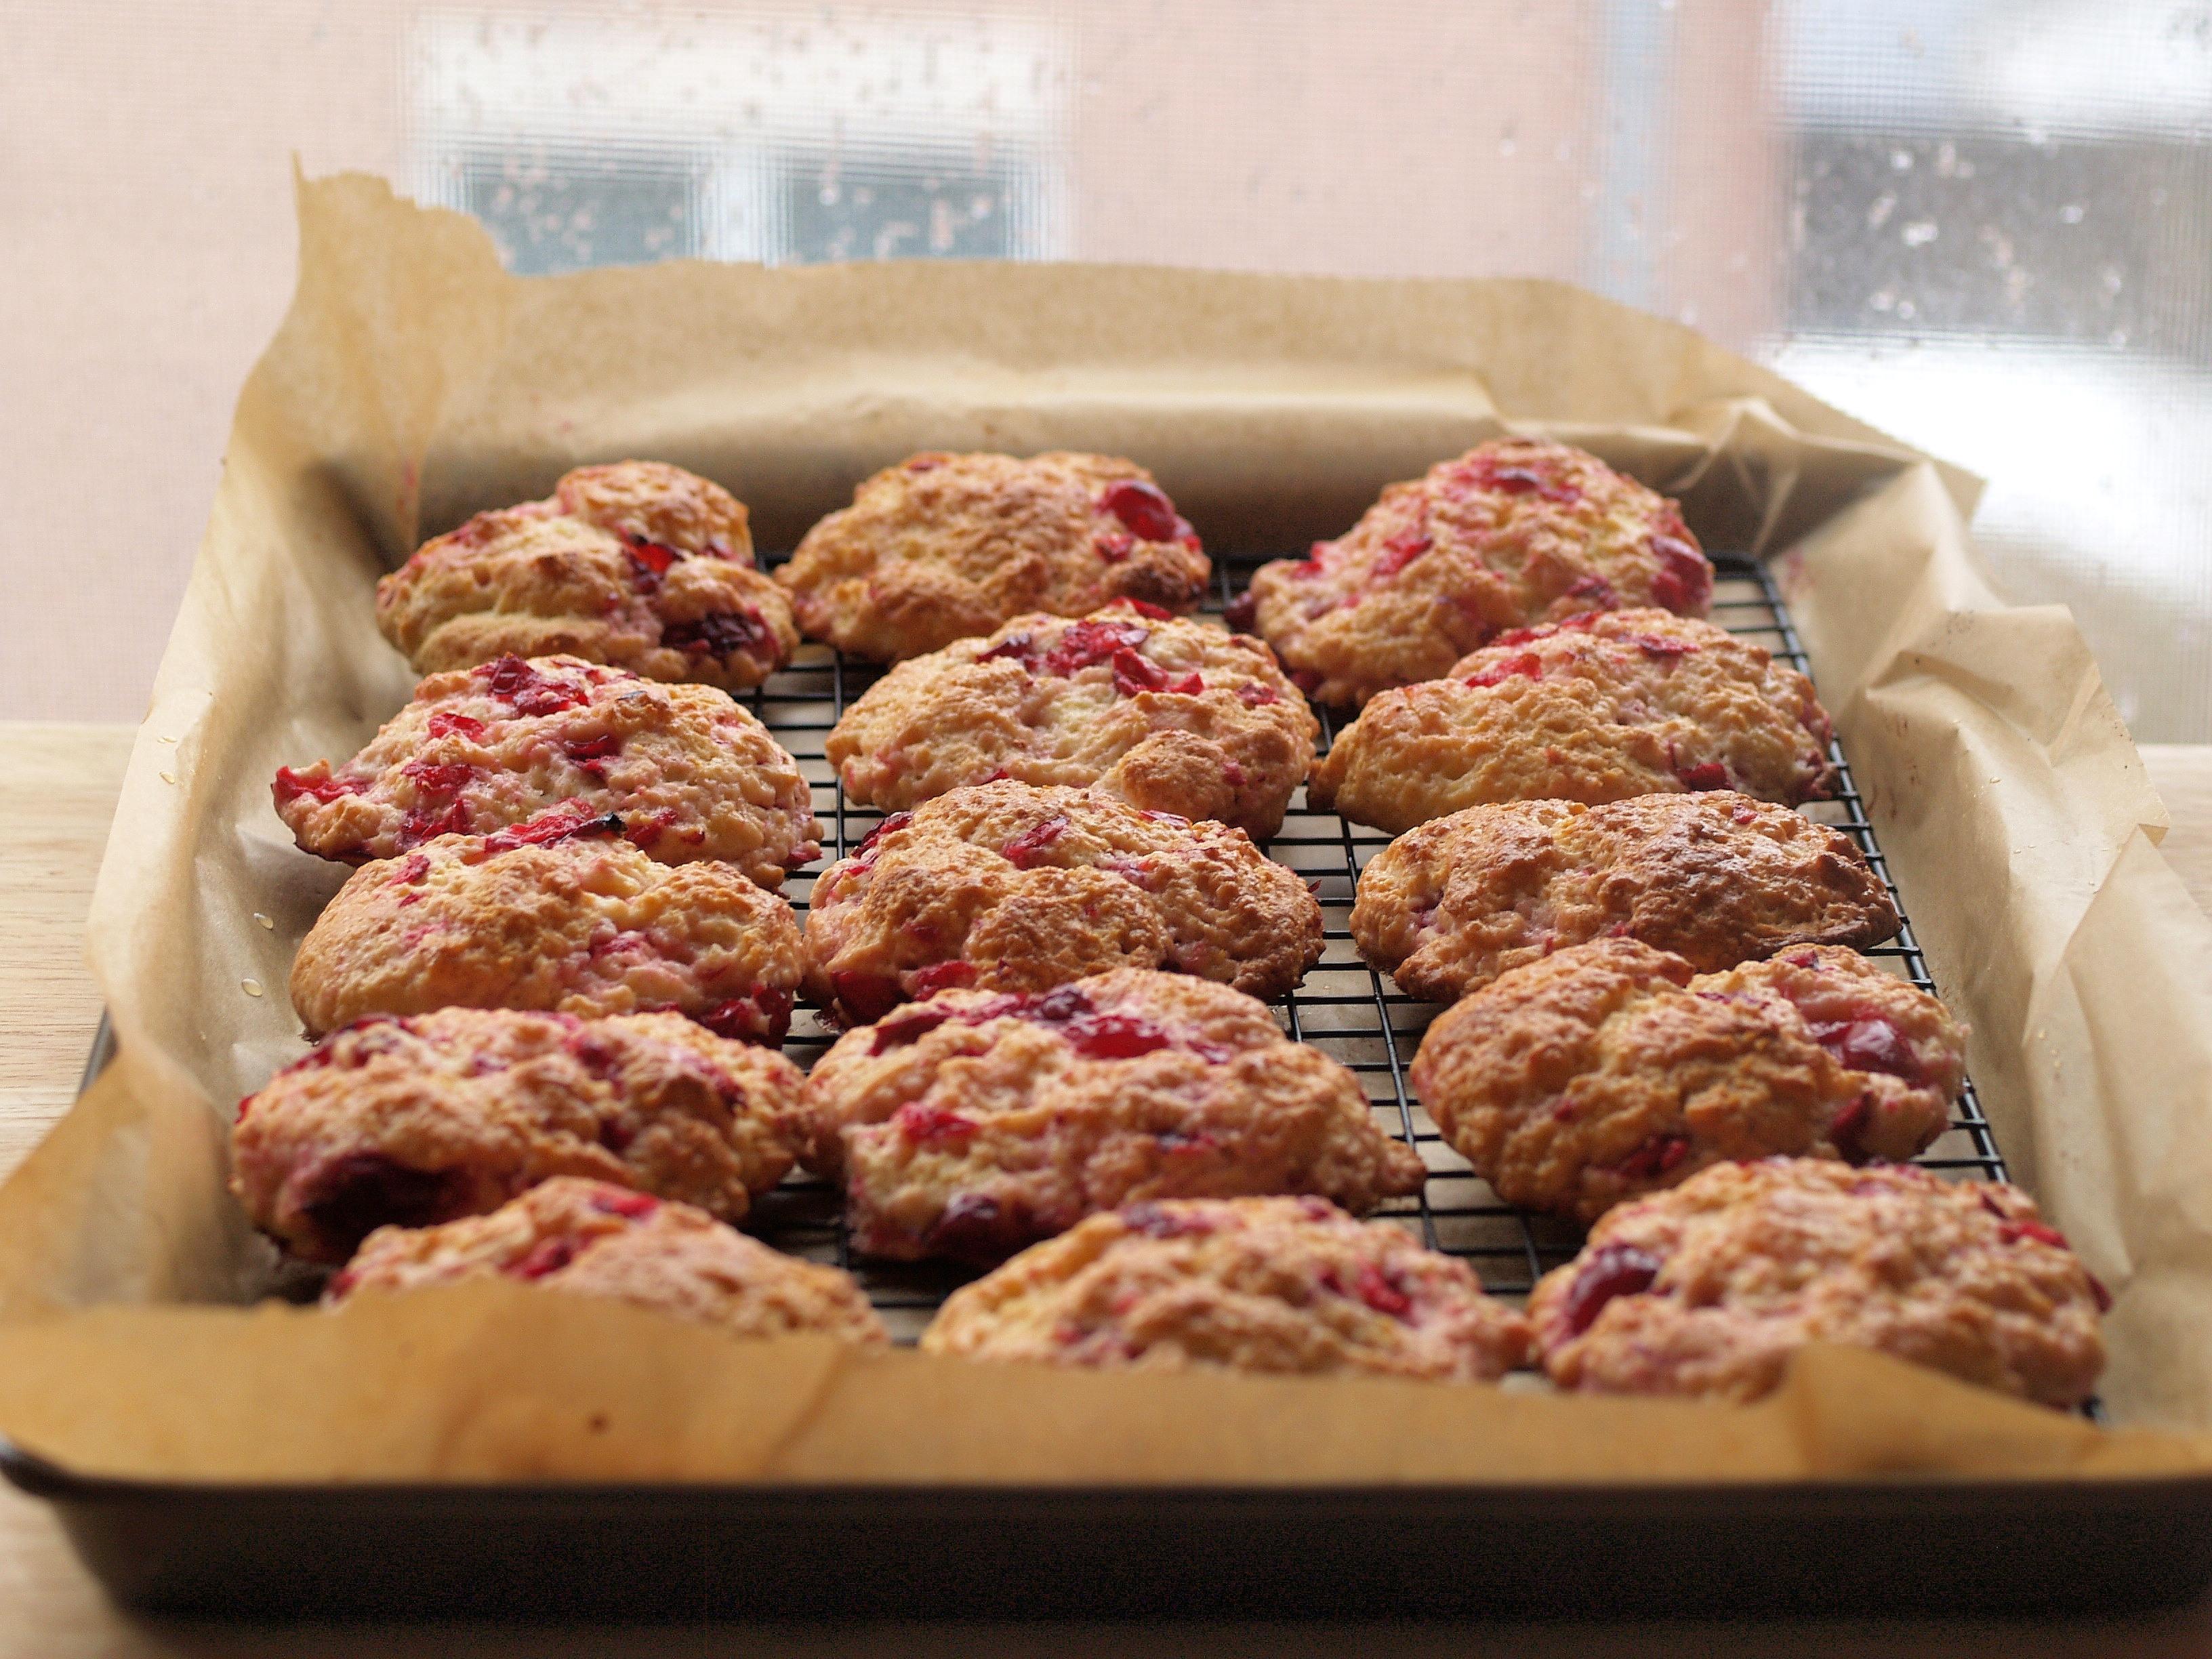 meyer lemon and fresh cranberry scones